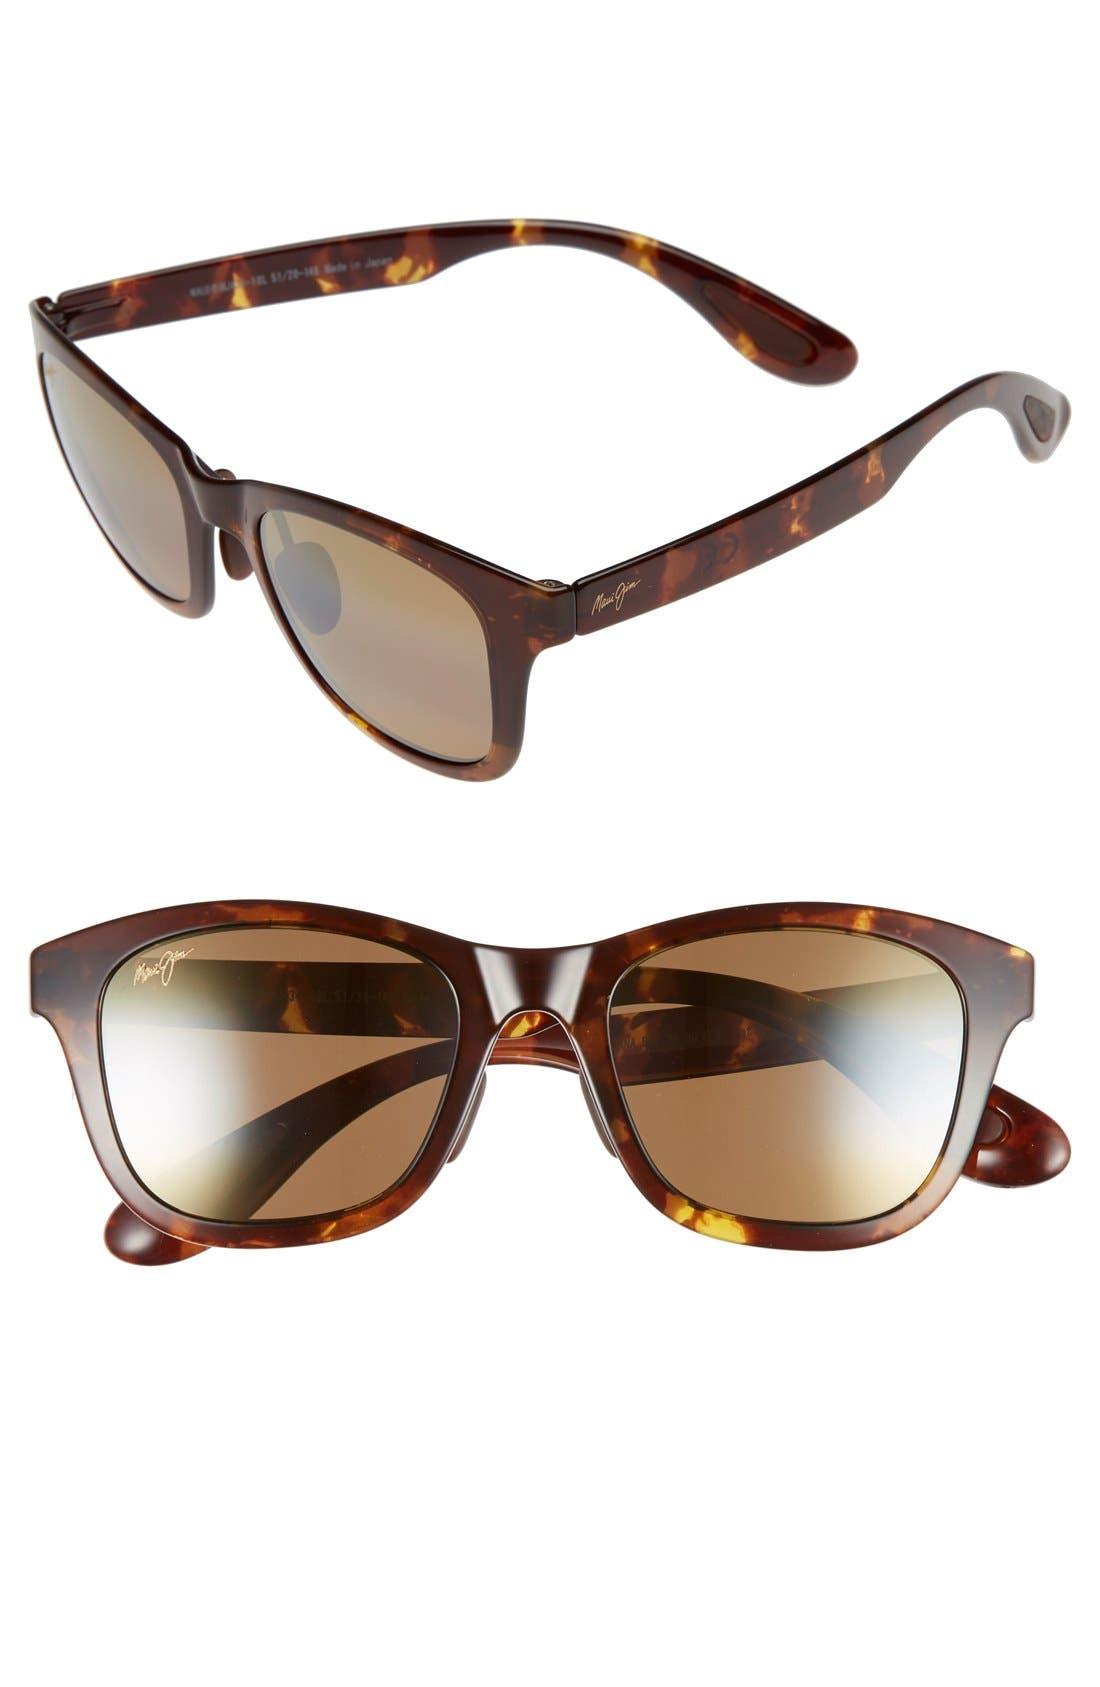 Maui Jim Hana Bay 51Mm Polarizedplus2 Sunglasses -